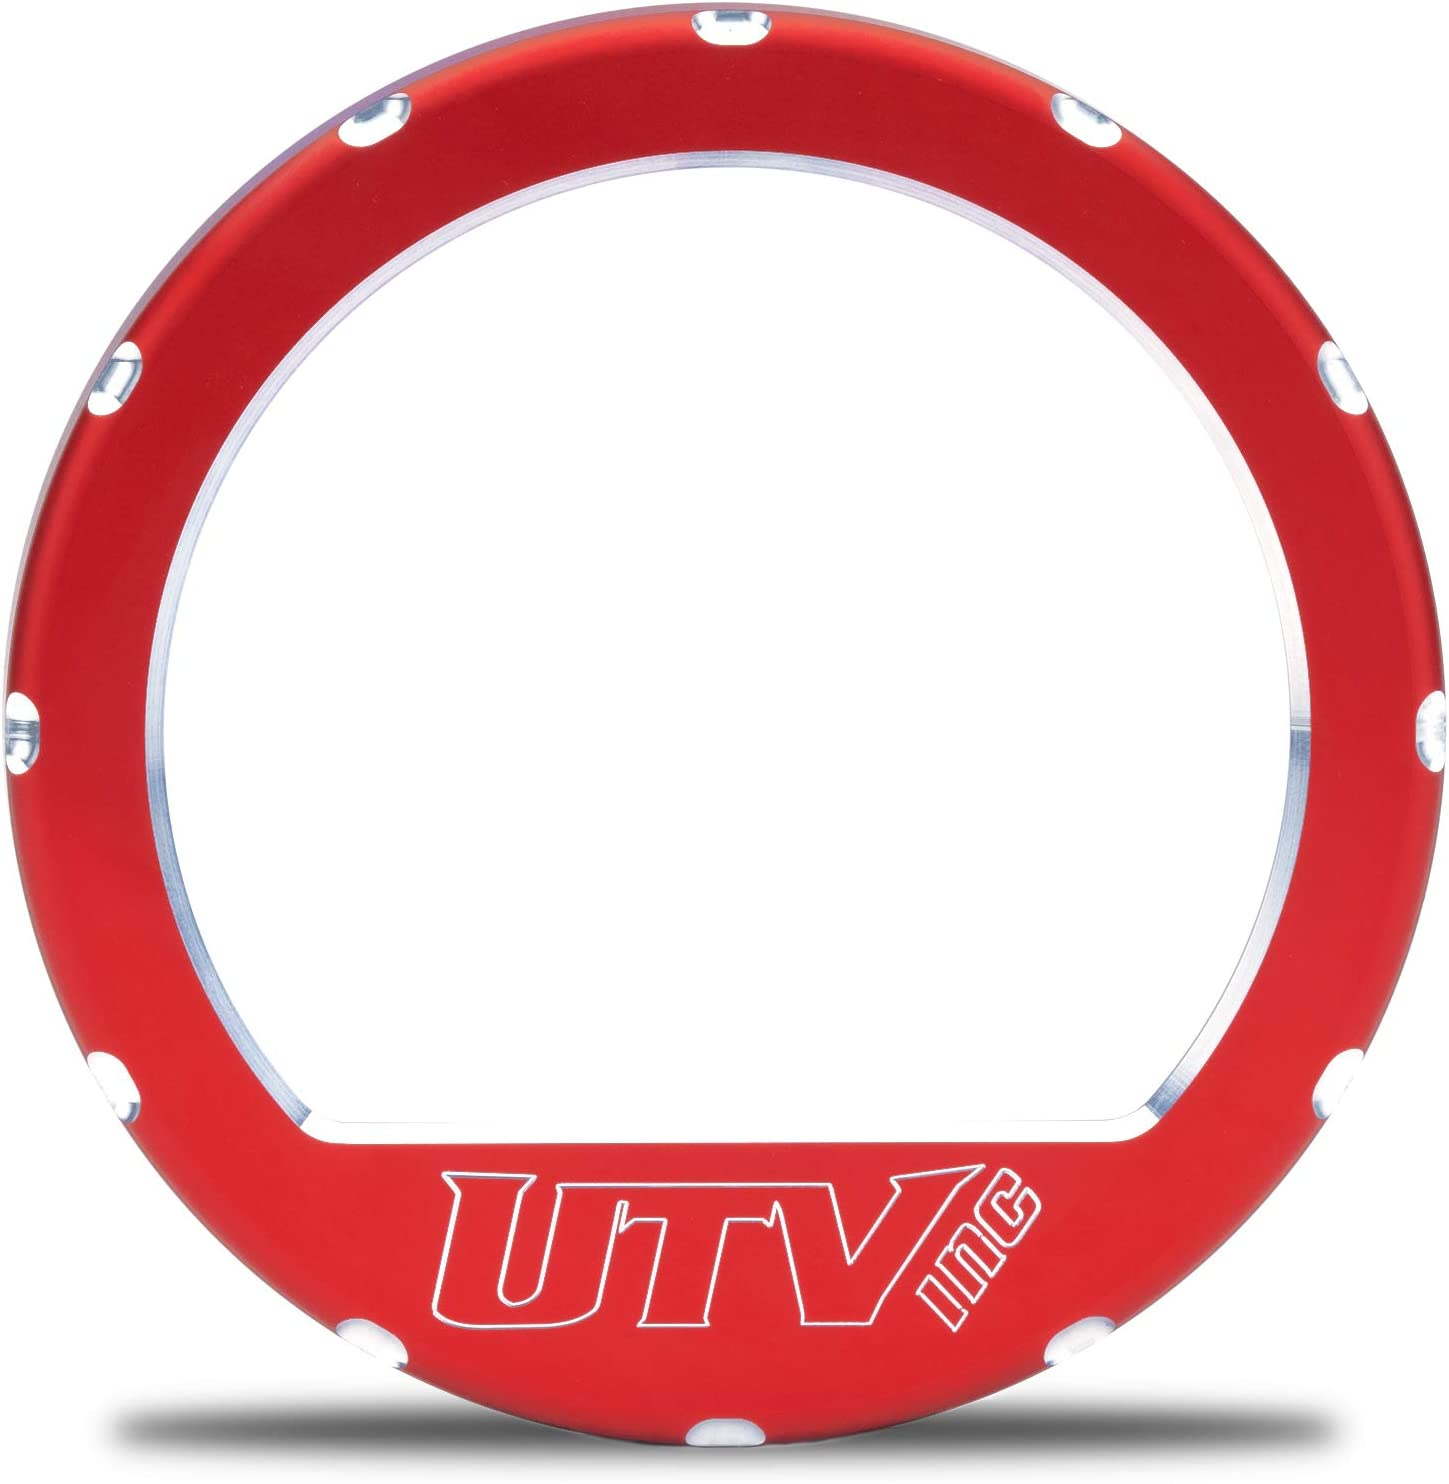 UTV INC Polaris RZR Red Cheap bargain Cheap bargain Aluminum Speedometer Billet Bez Anodized